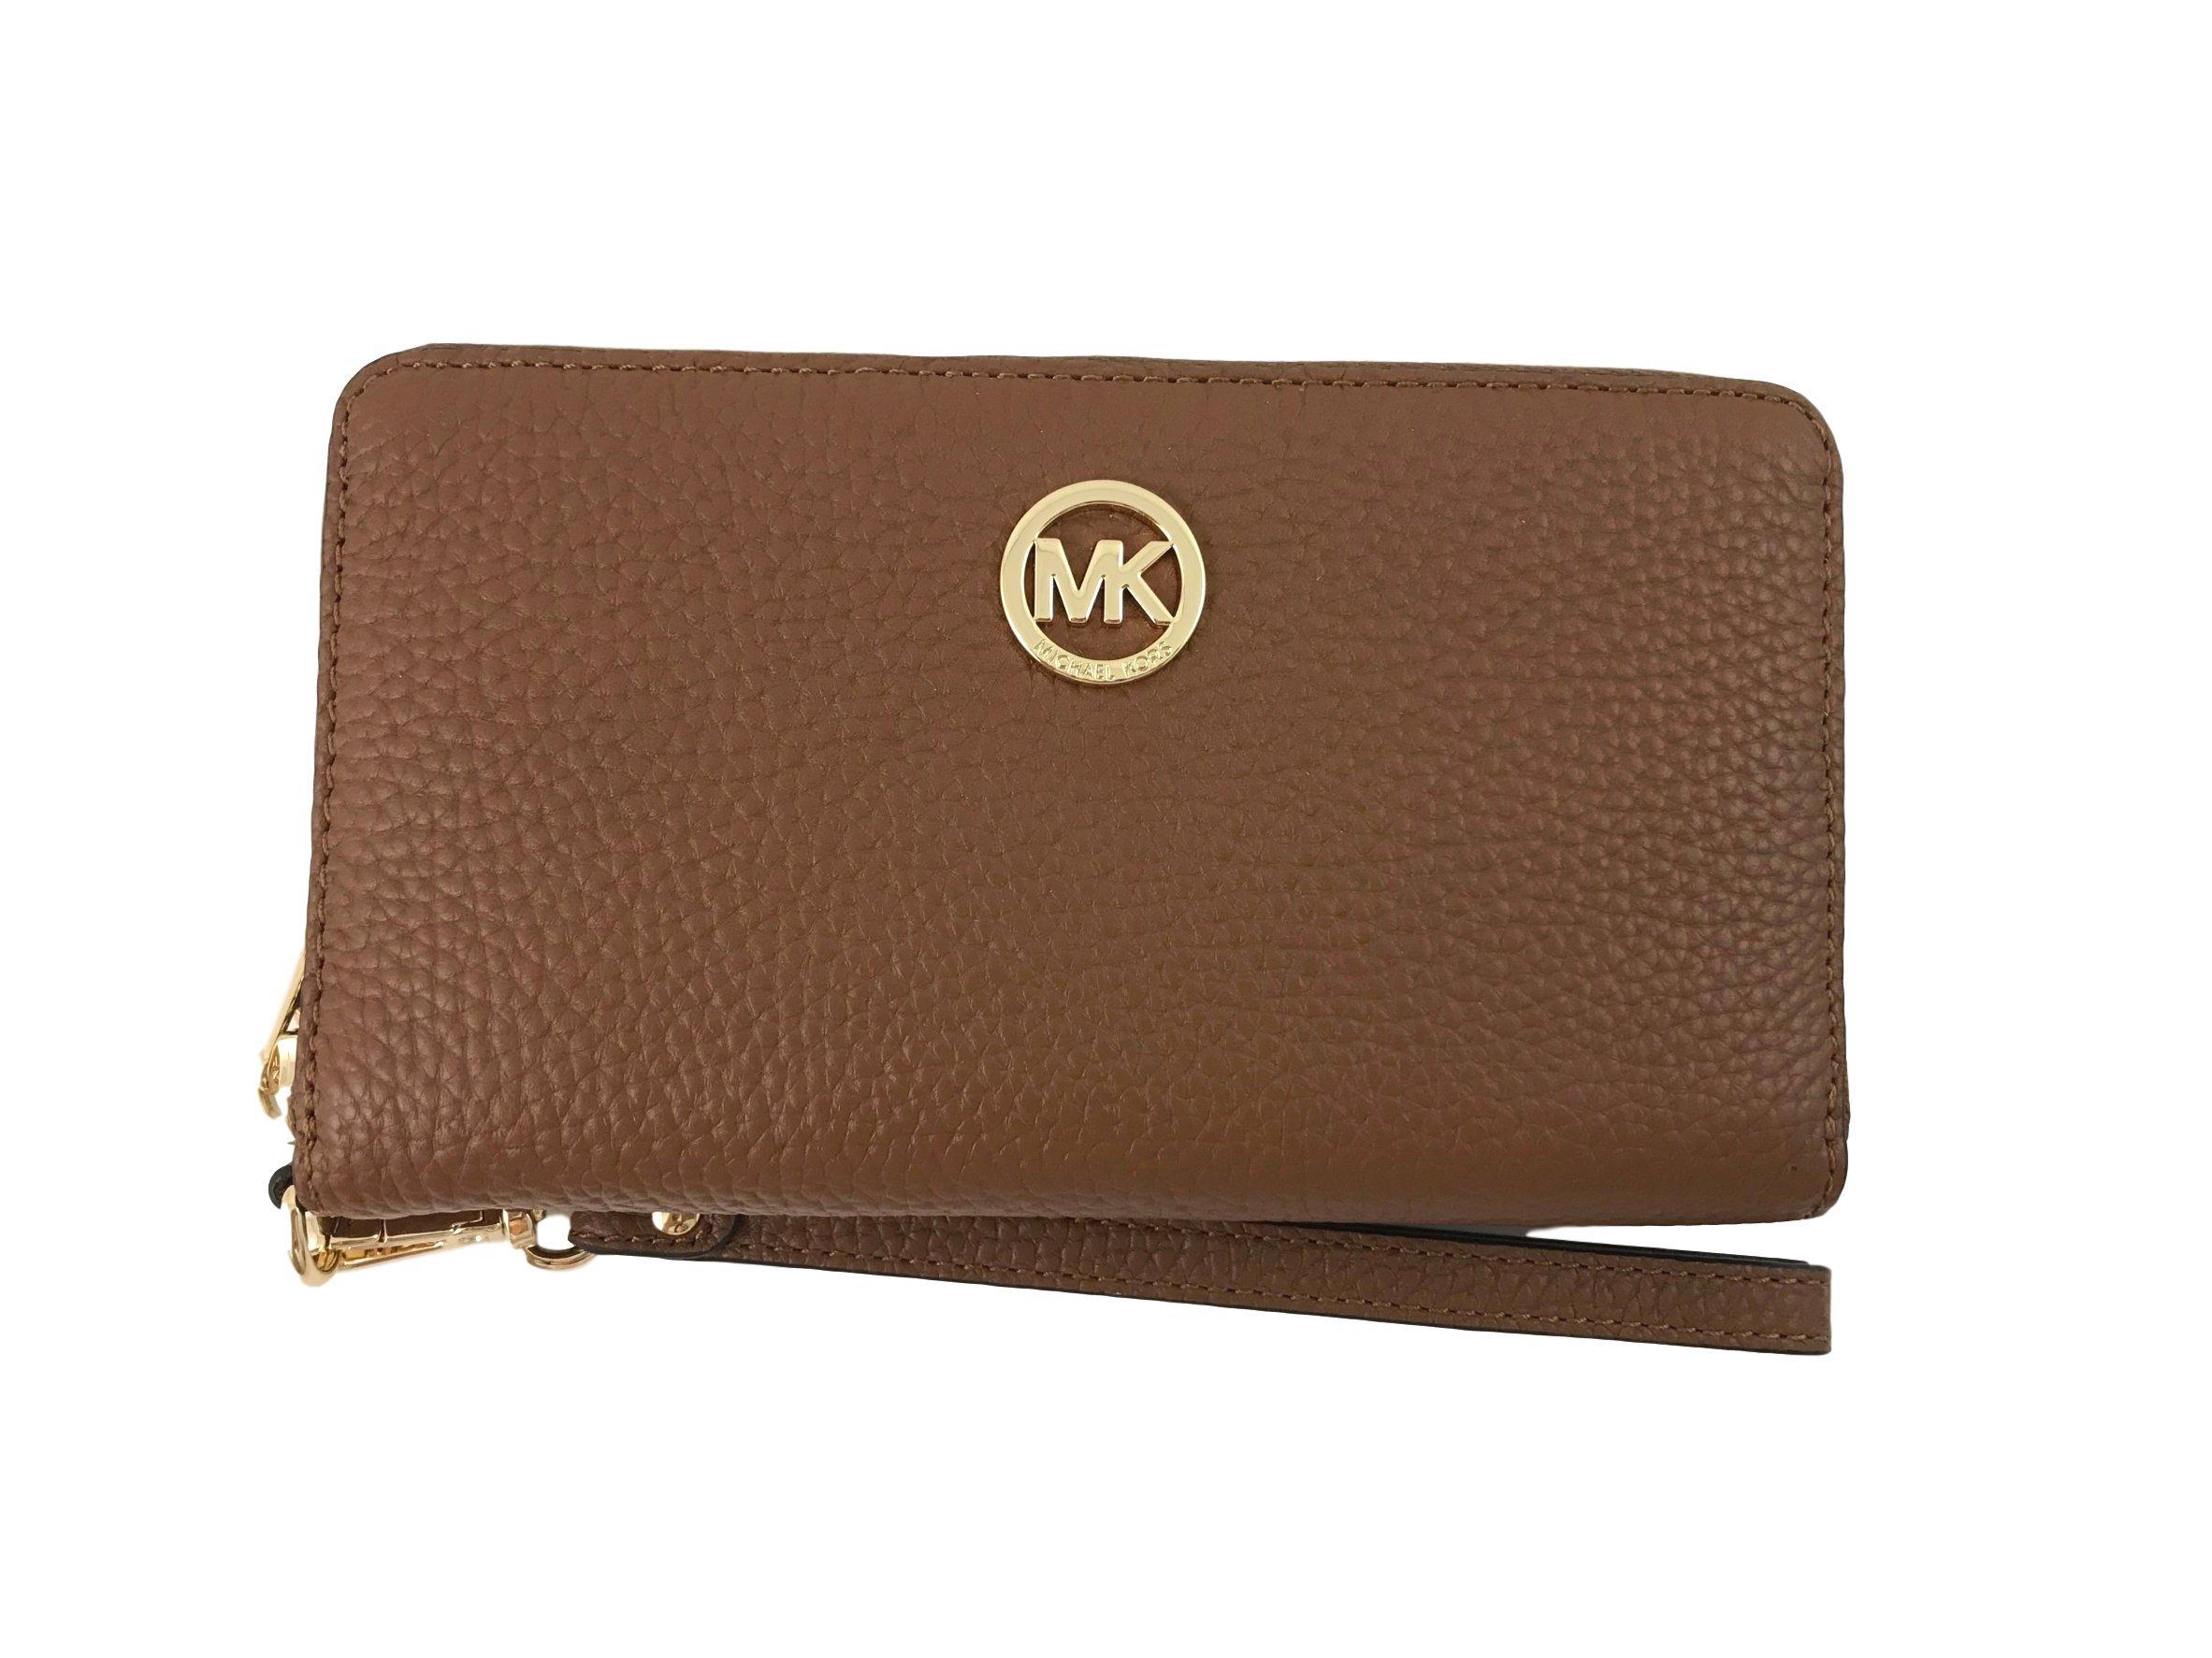 Michael Kors Fulton Large Flat Multifunction Leather Phone Case (Luggage Brown)